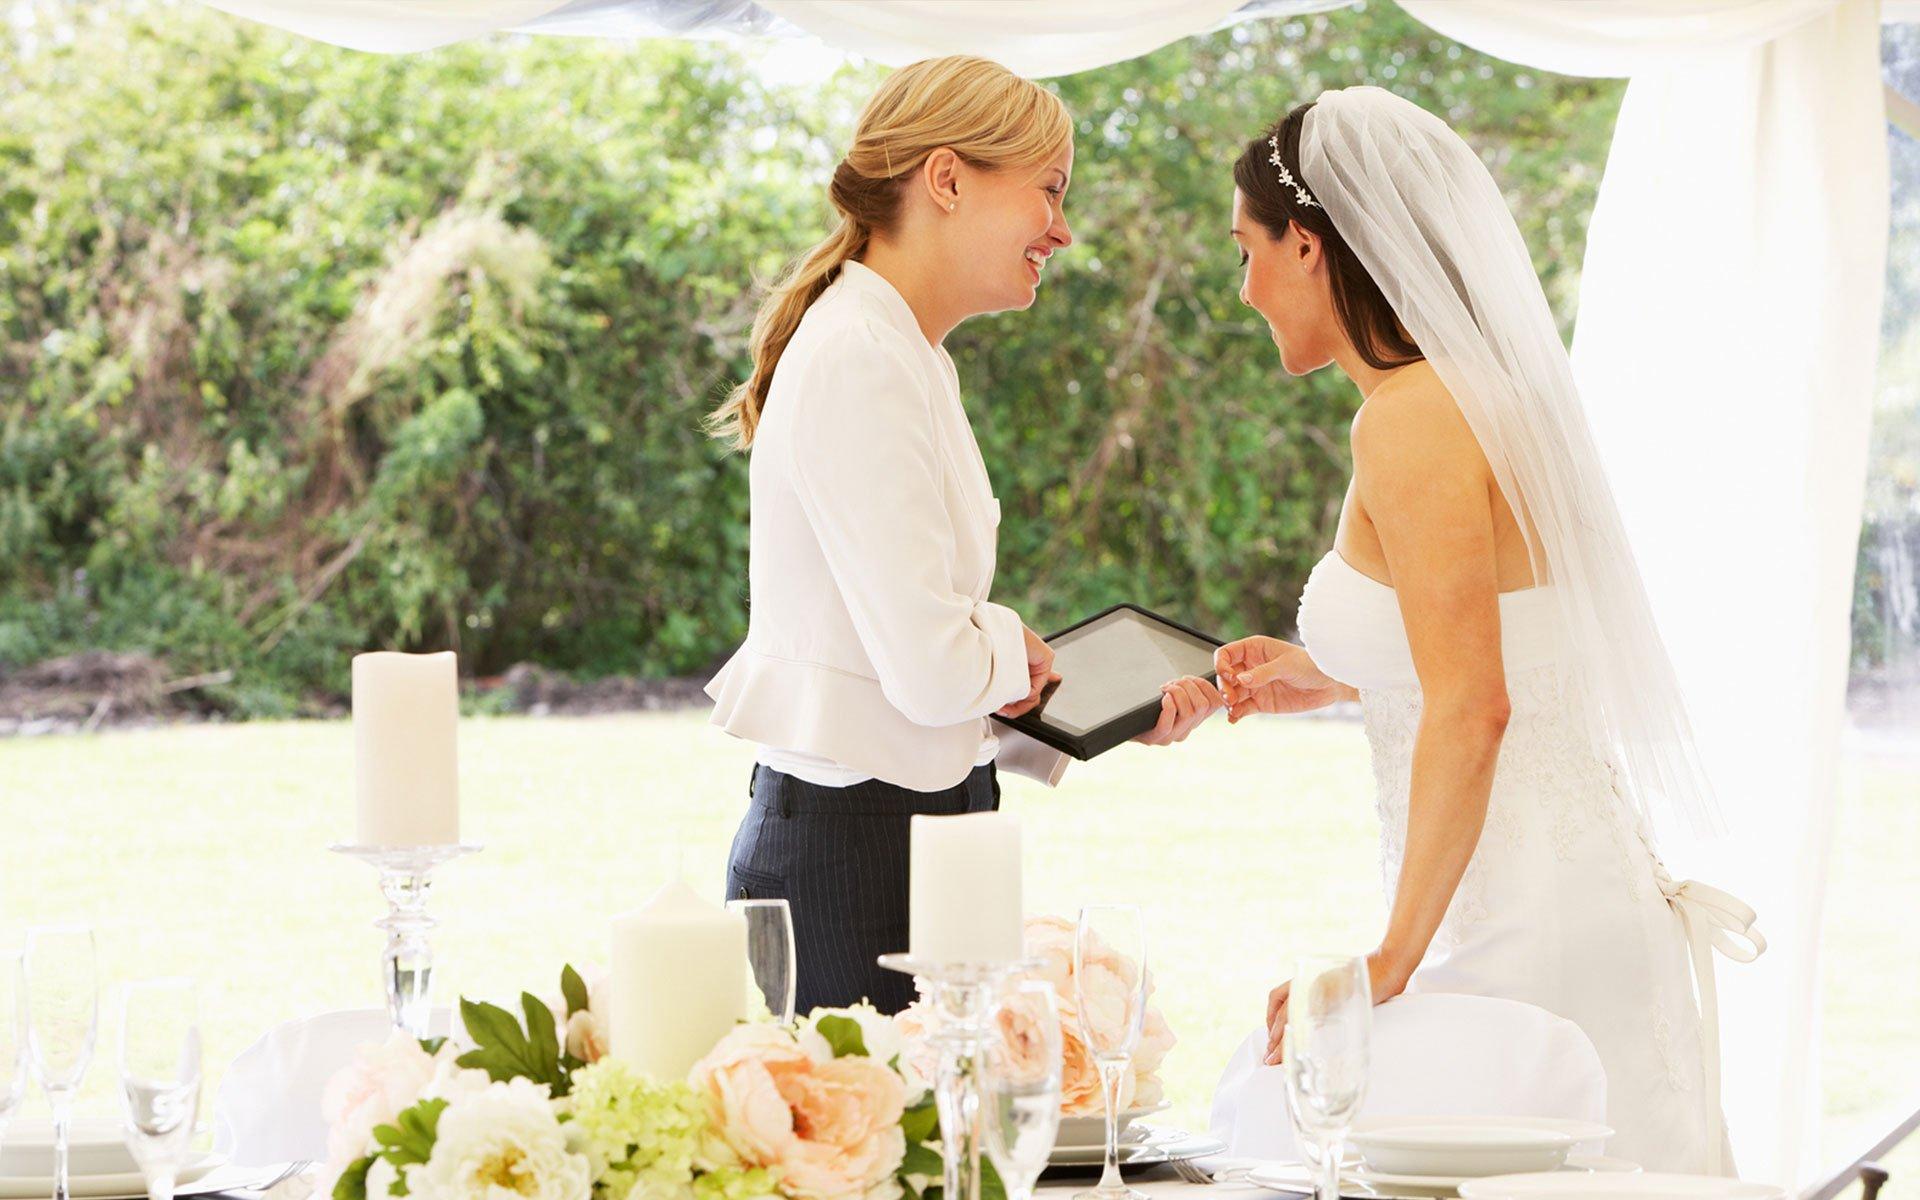 How To Spot The Best Destination Wedding Planner